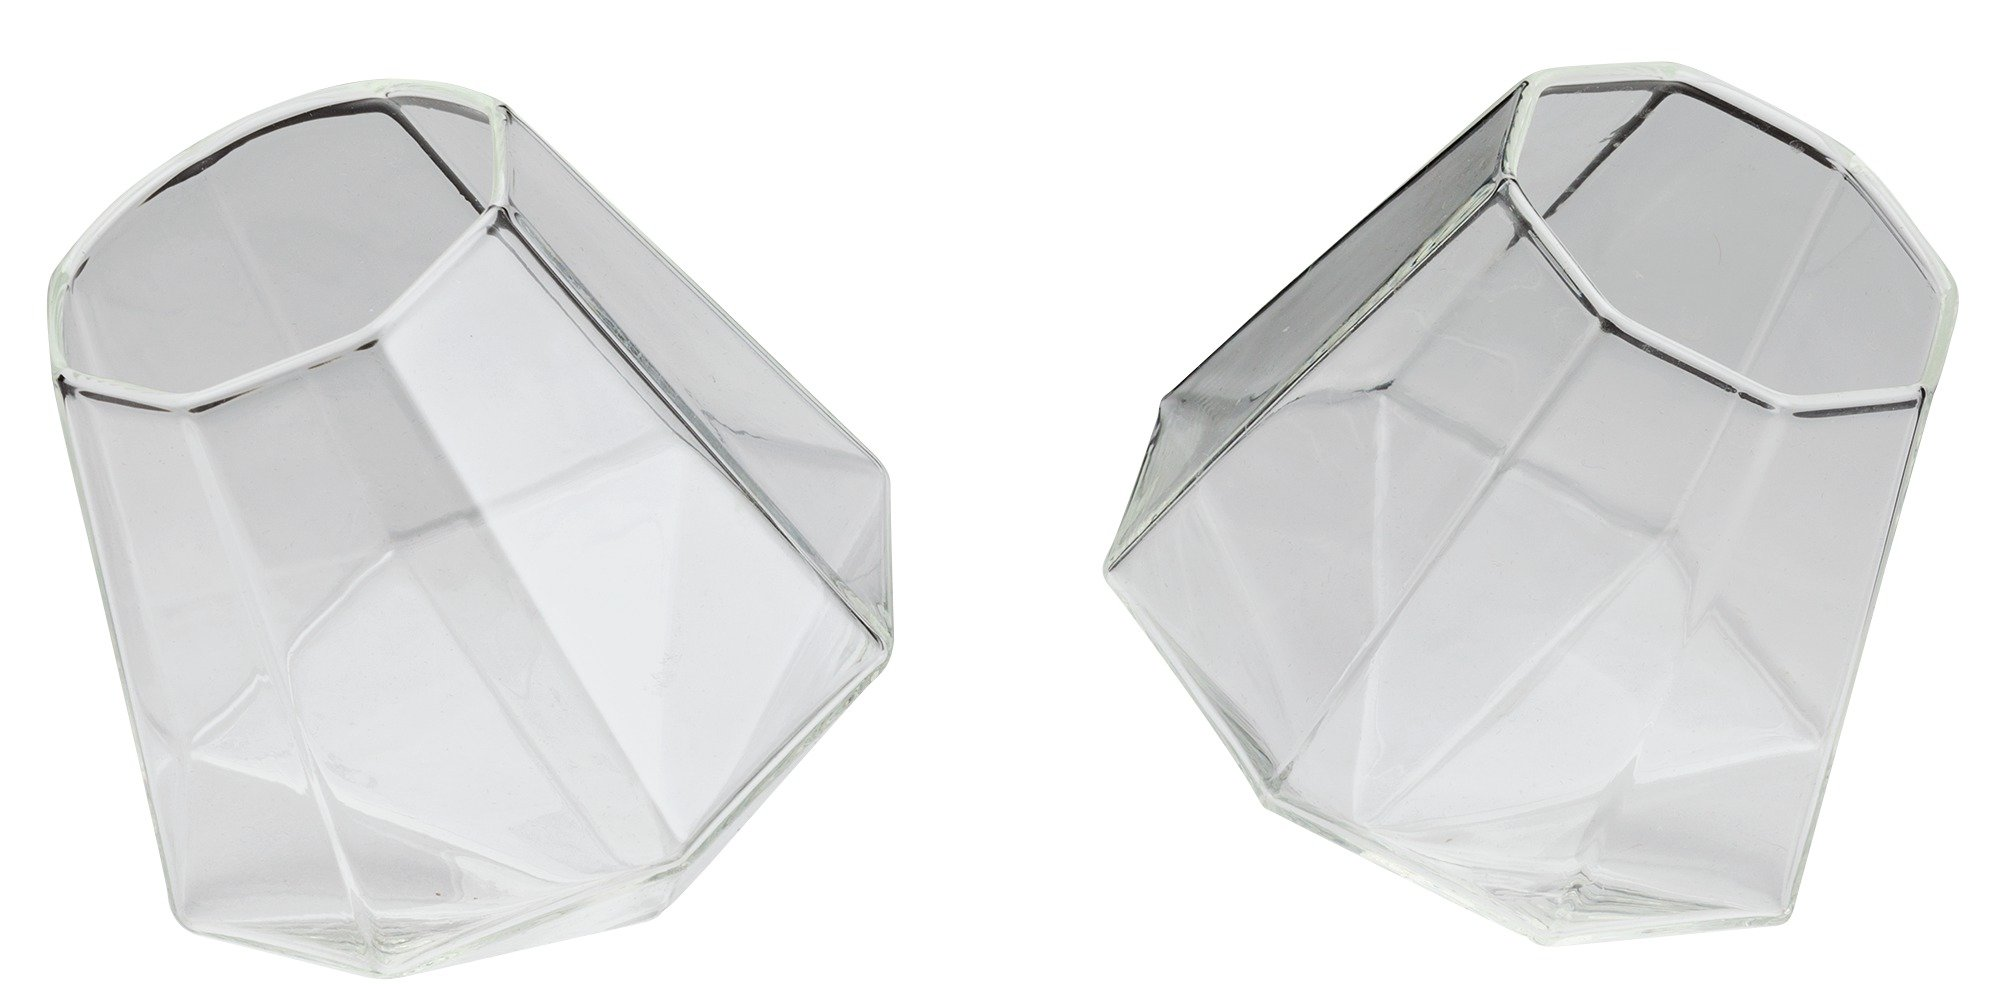 Image of Diamond Whiskey Glasses - Set of 2